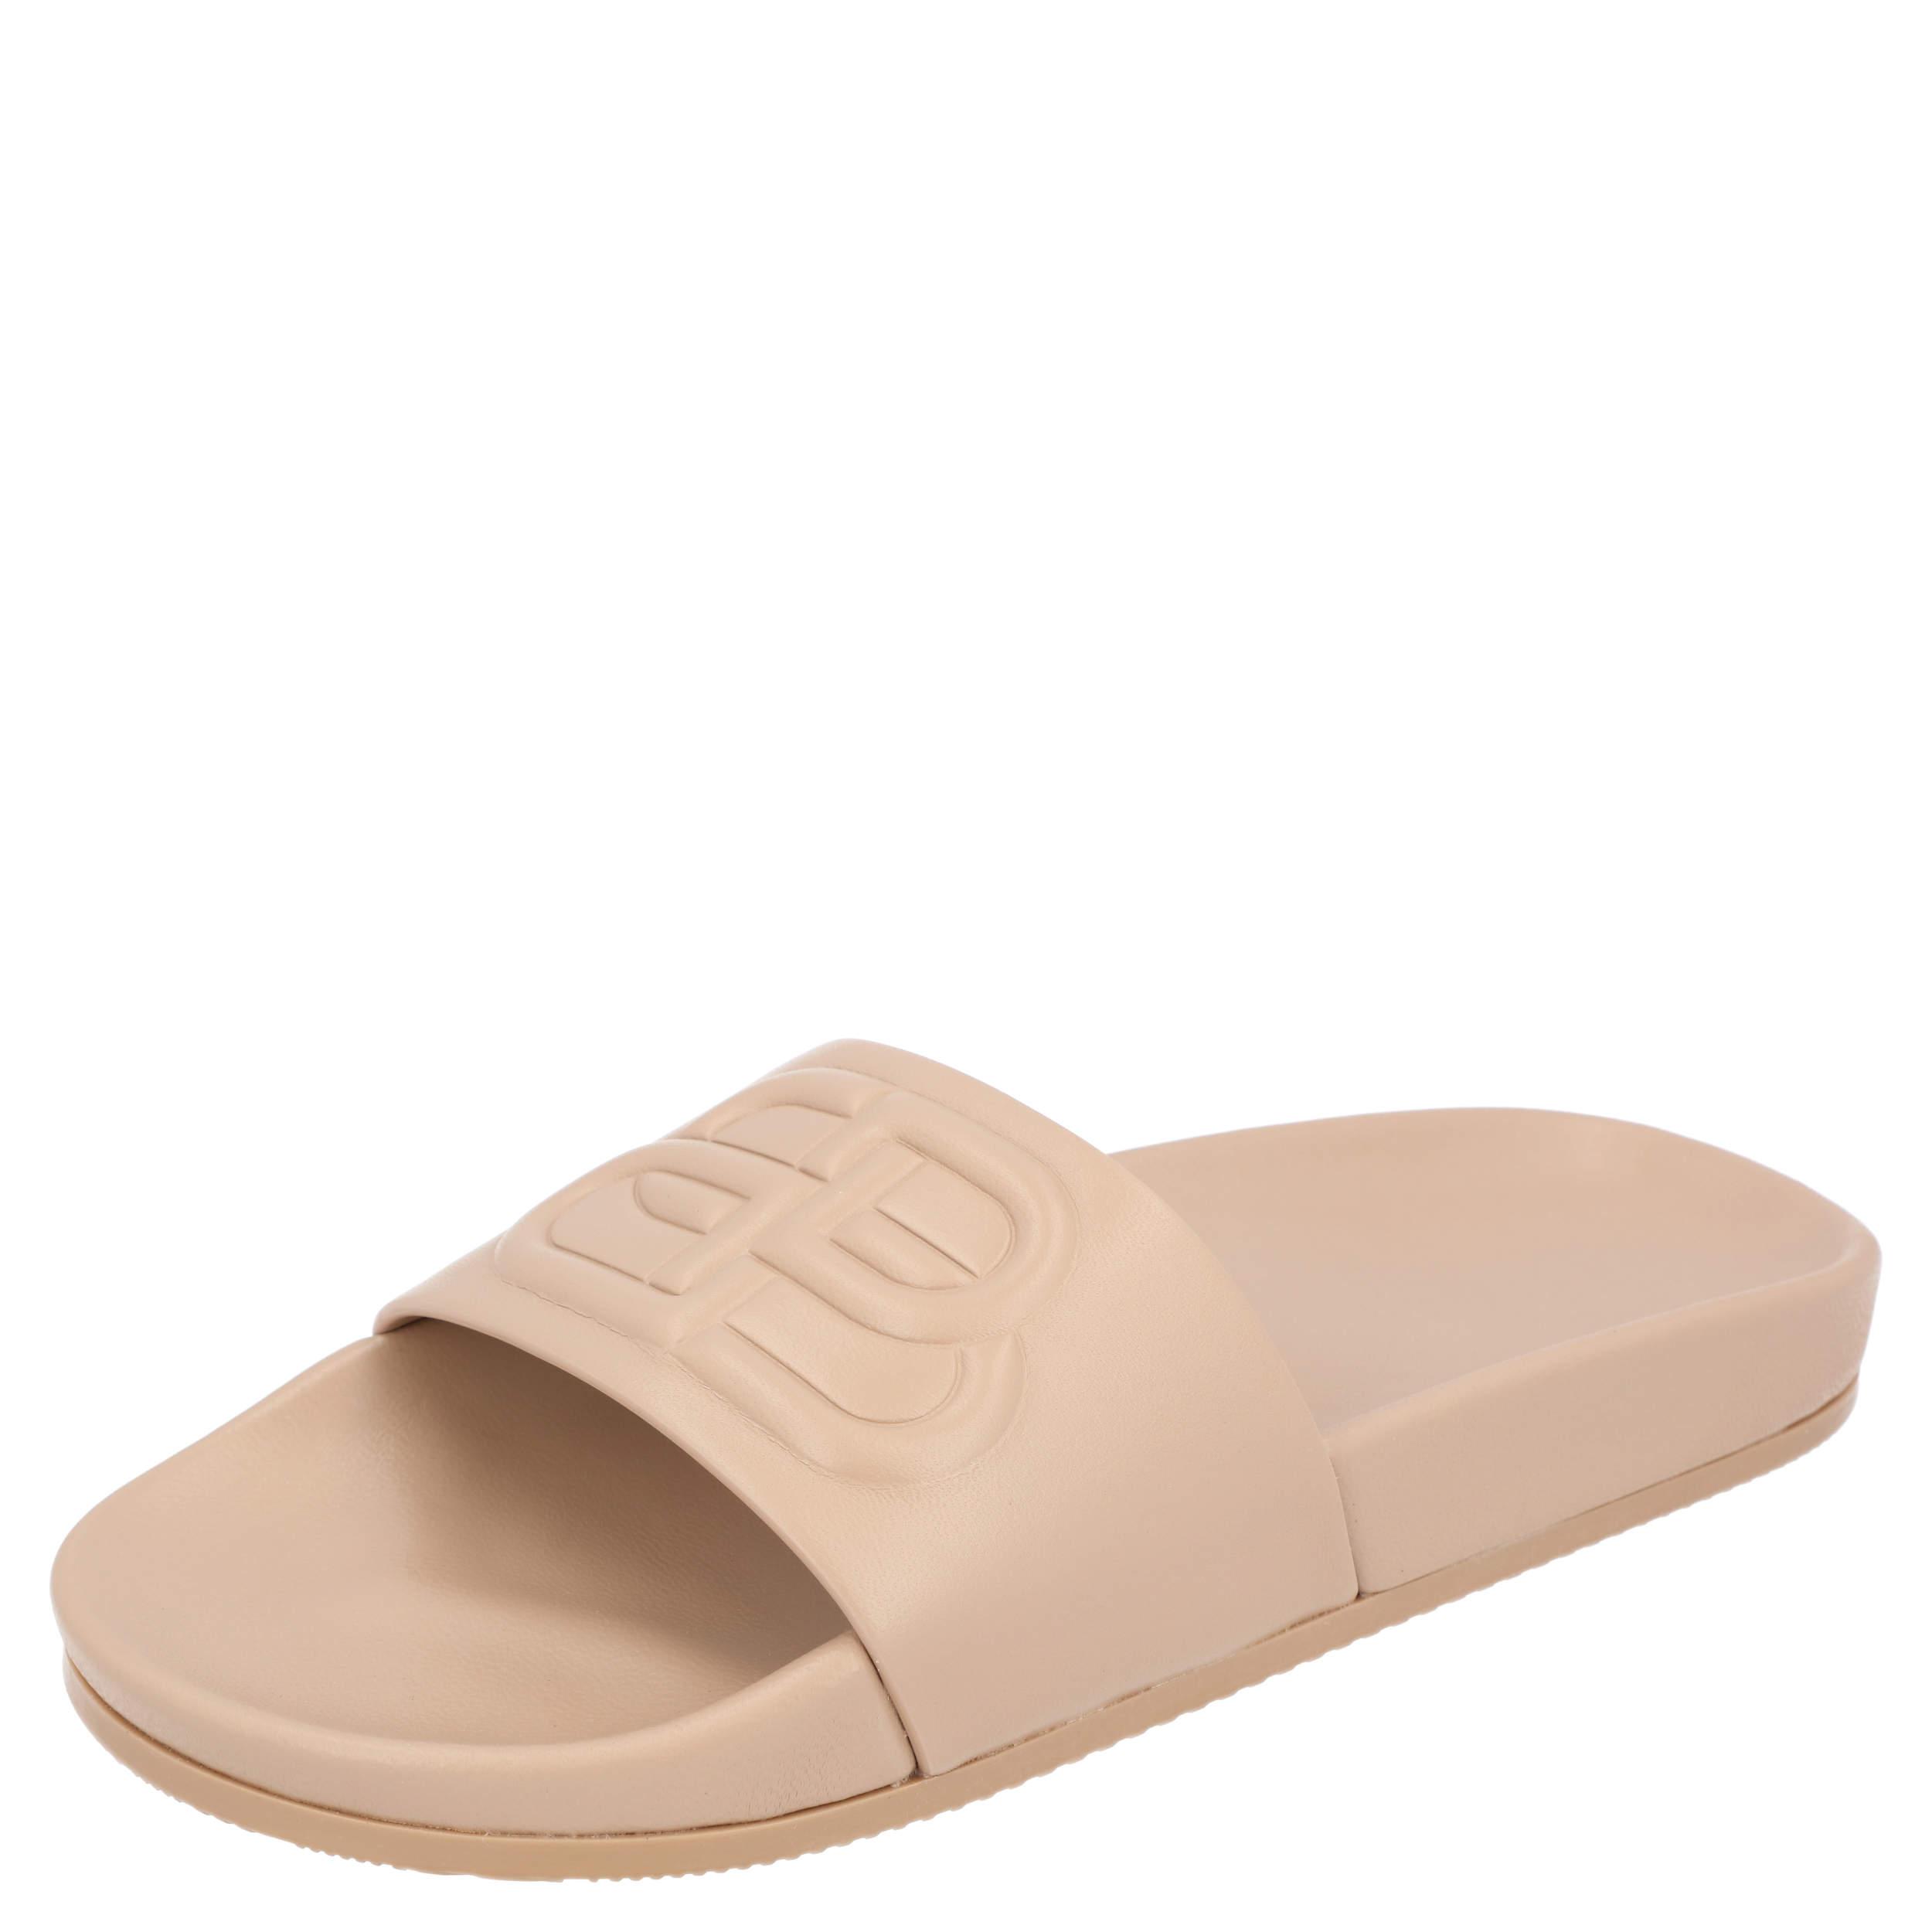 Balenciaga Piscine Slides Size 36